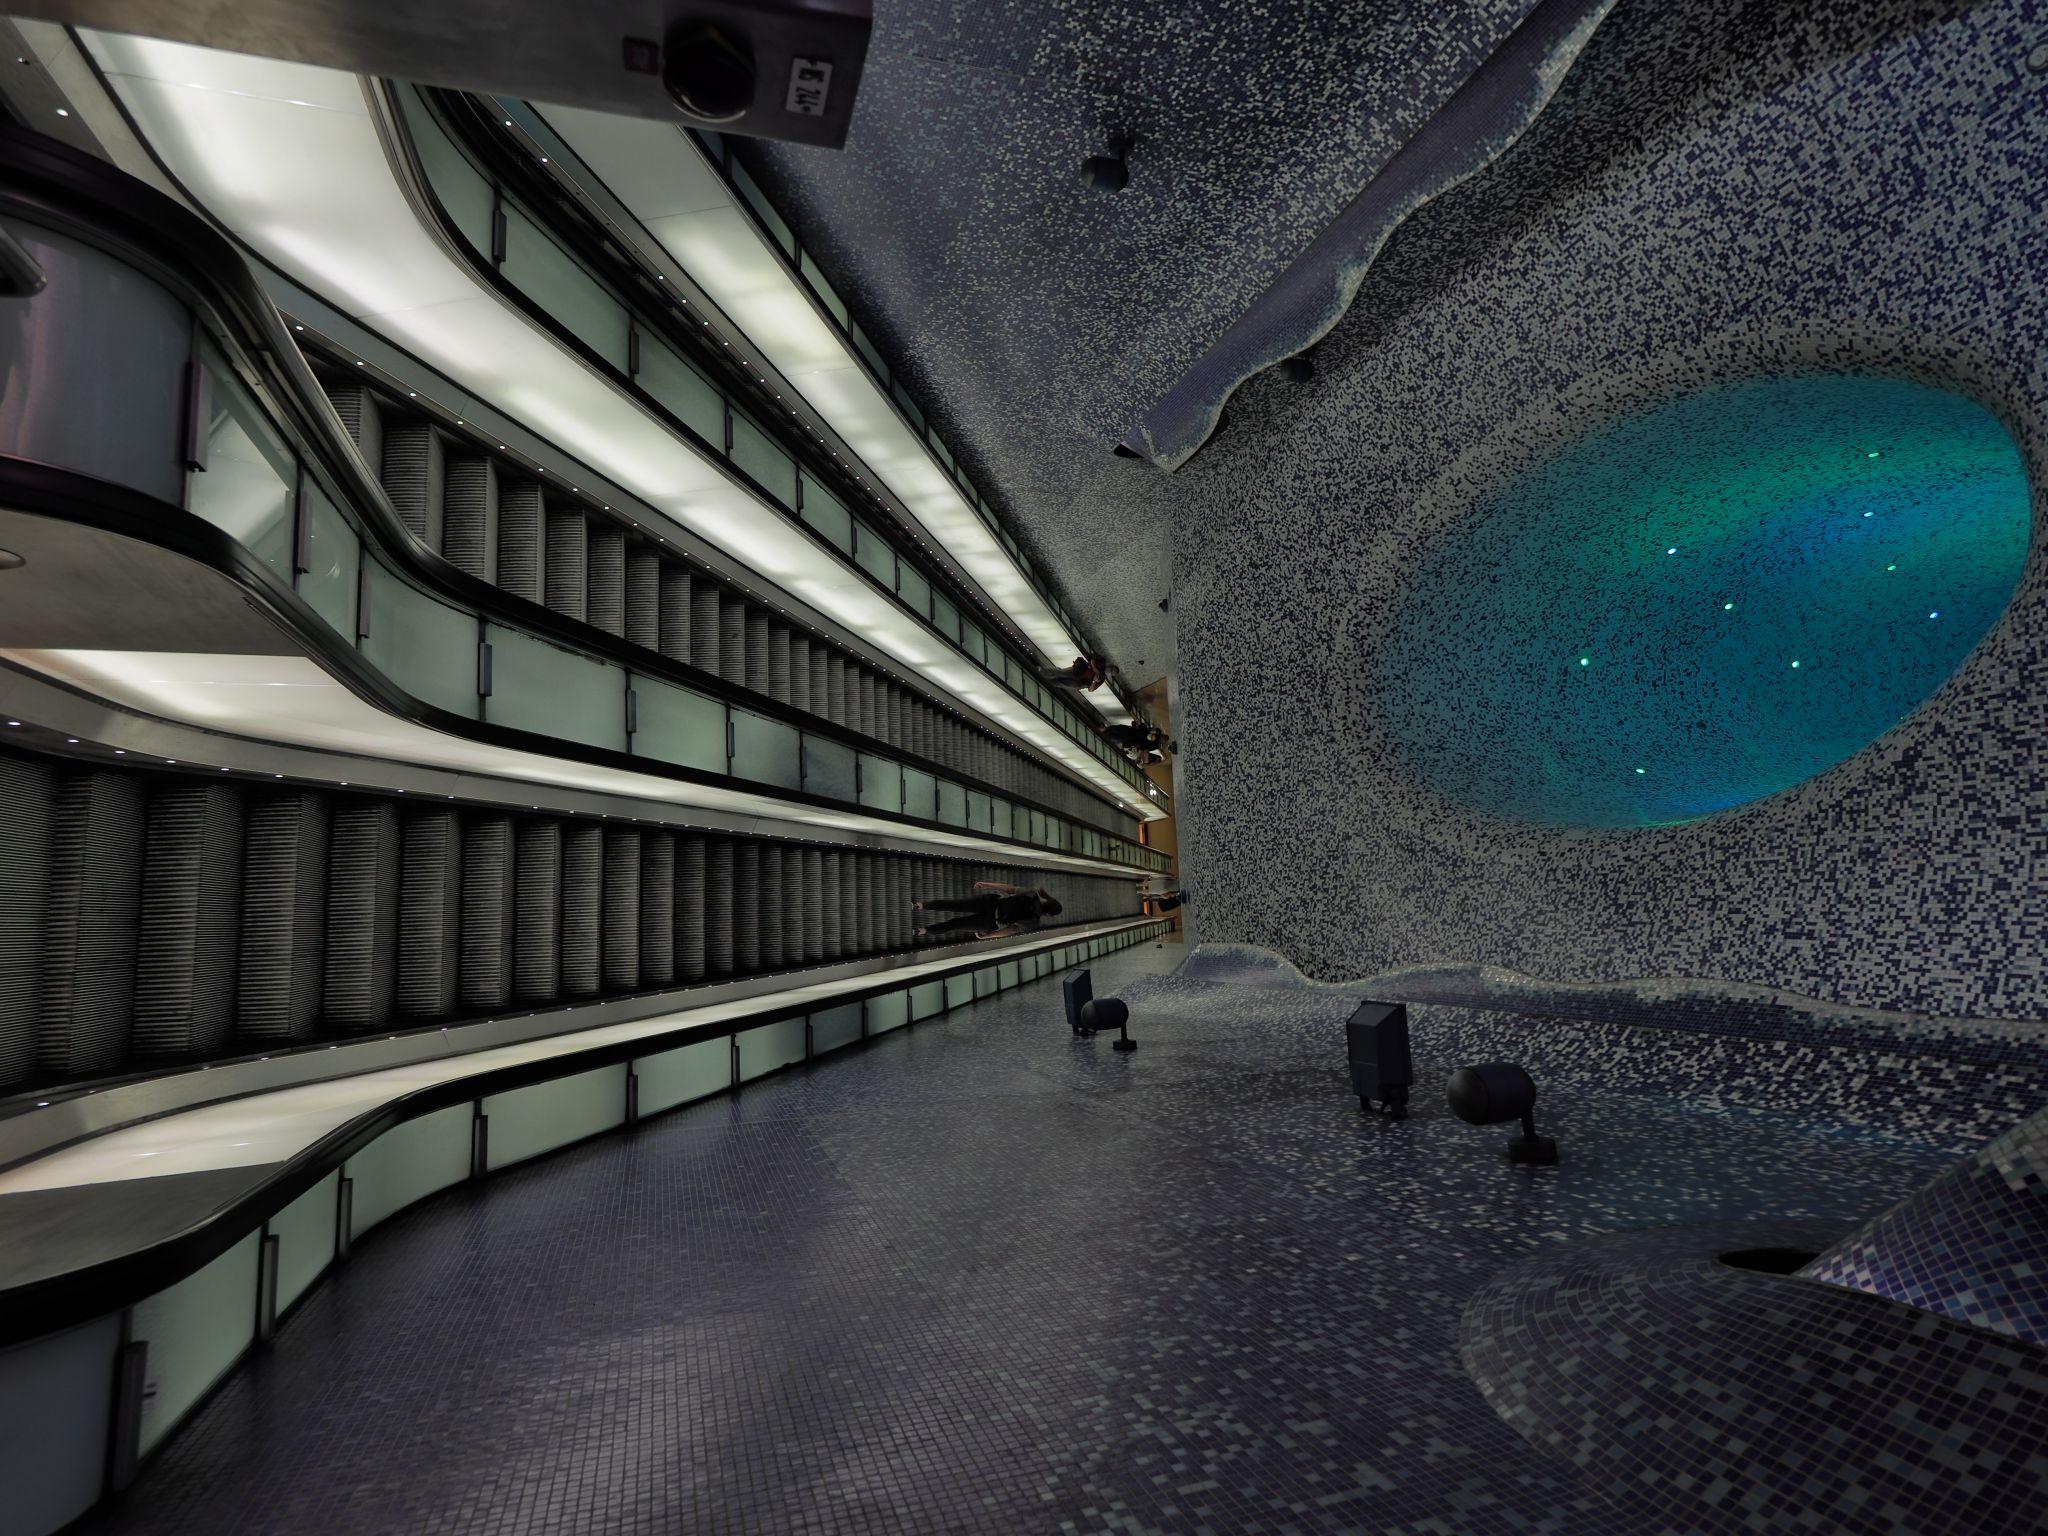 Metro Station Via Toledo, Italy